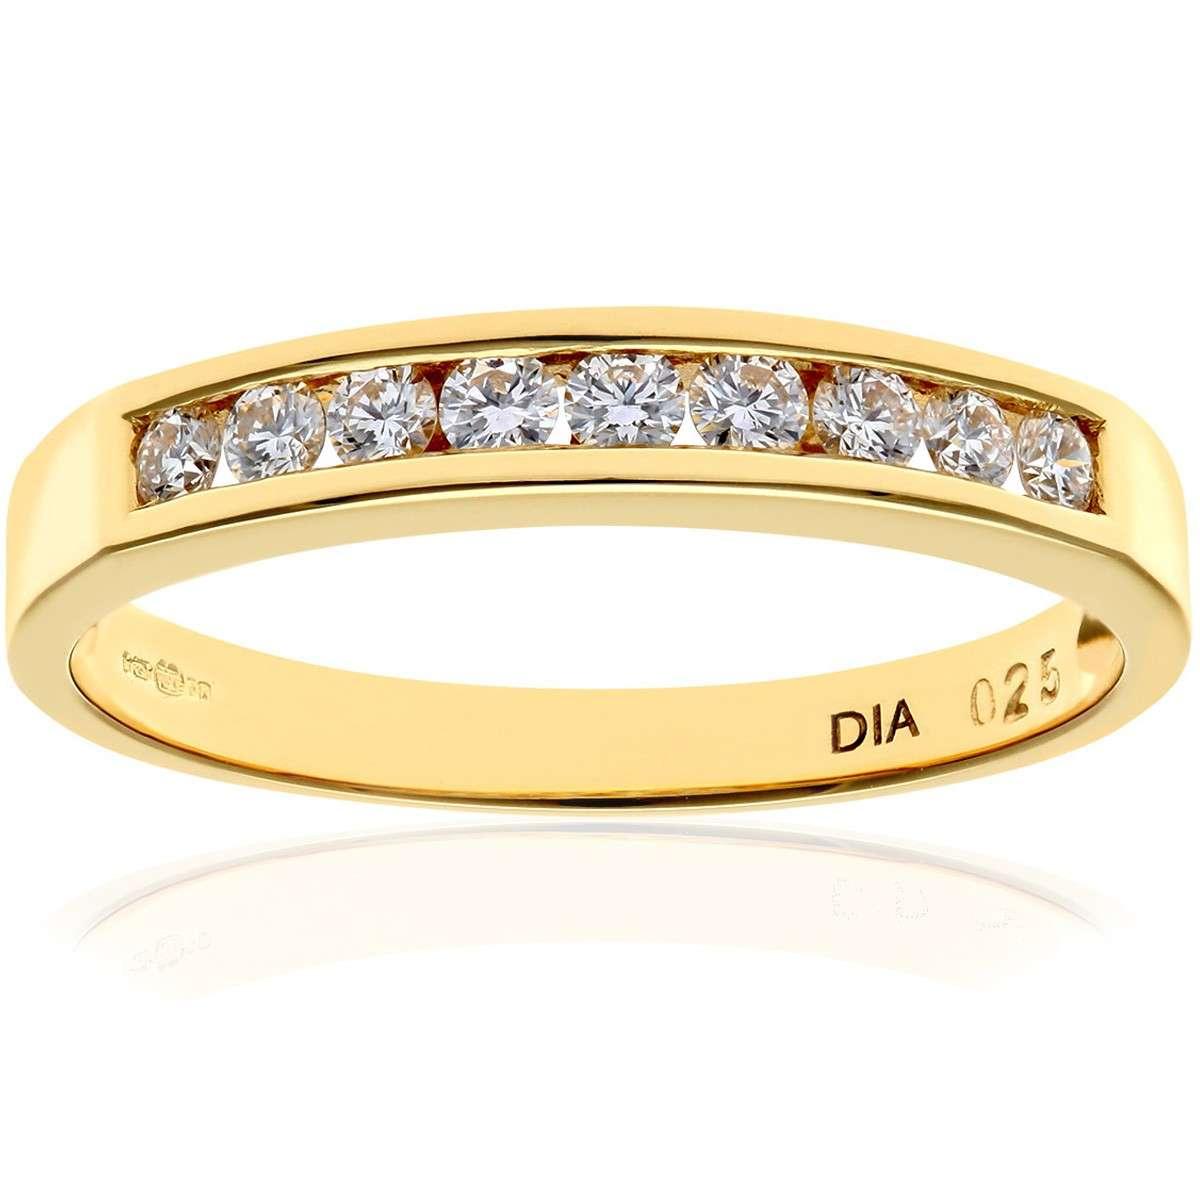 18CT YELLOW GOLD 0.25CT DIAMOND 9 STONE CHANNEL SET 1/2 ETERNITY RING